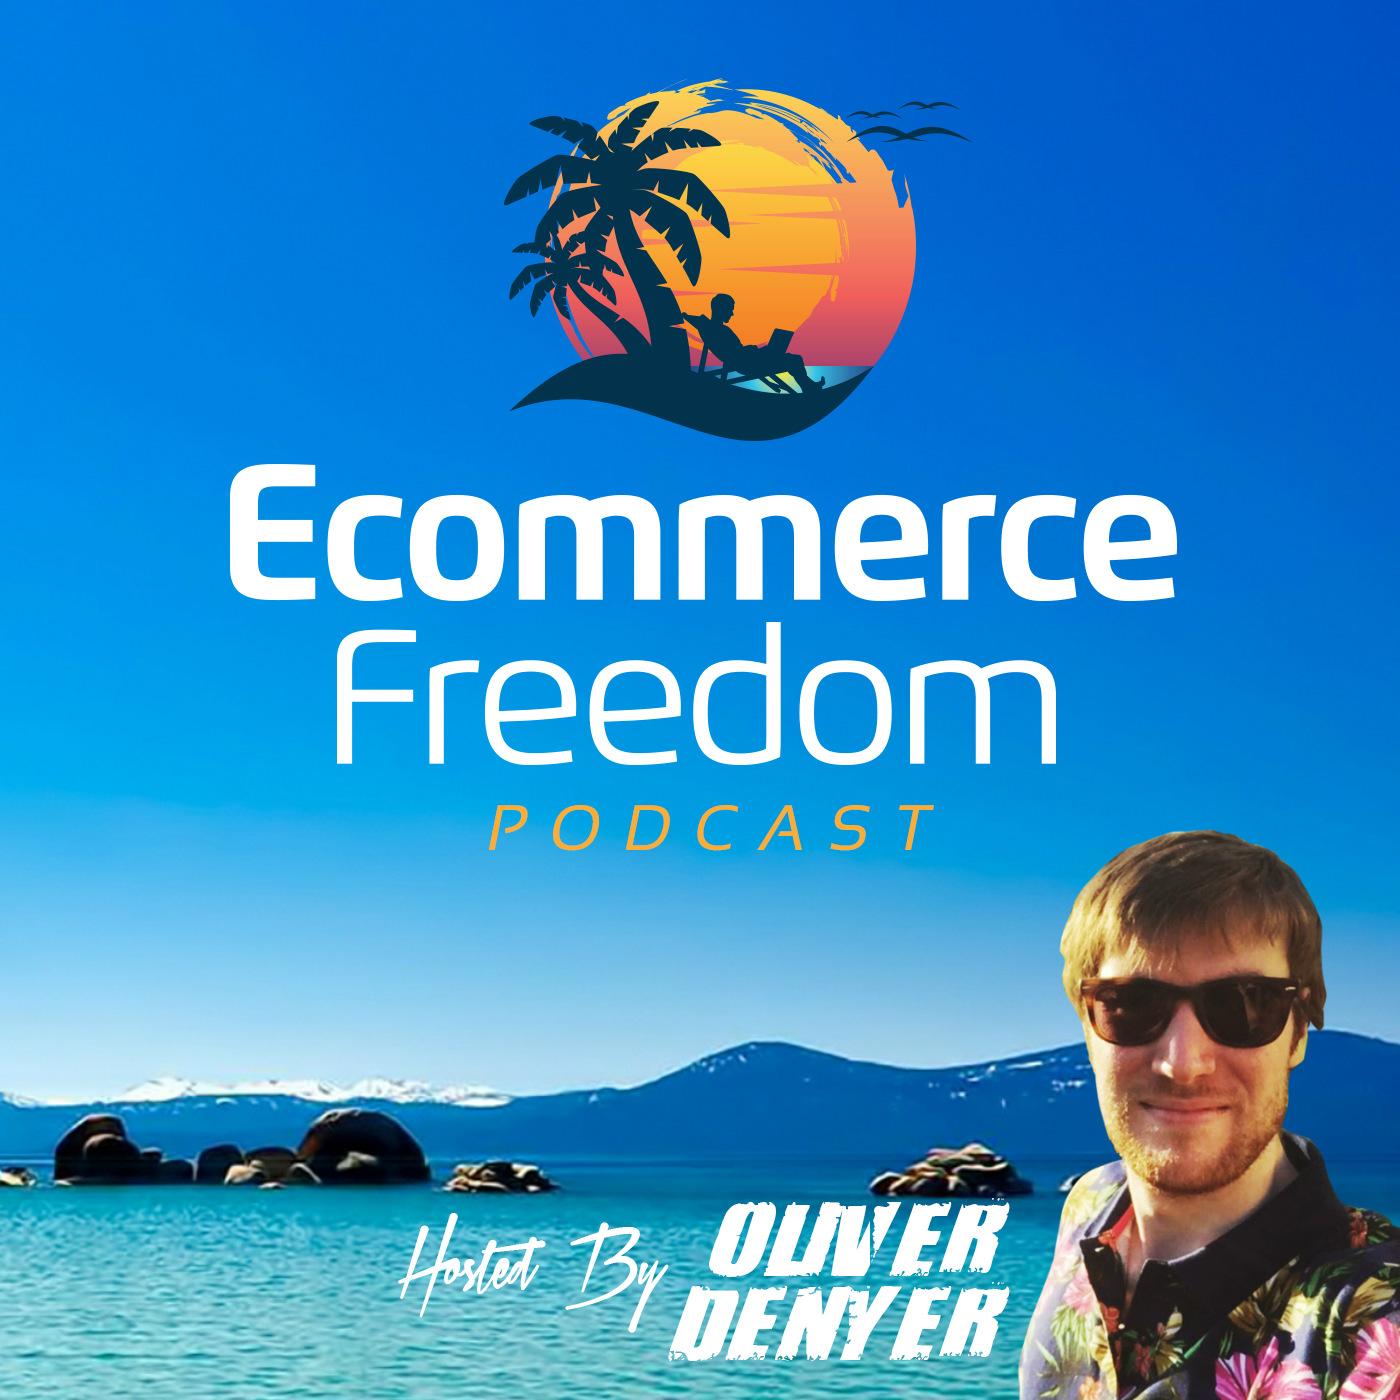 Ecommerce Freedom Podcast show art